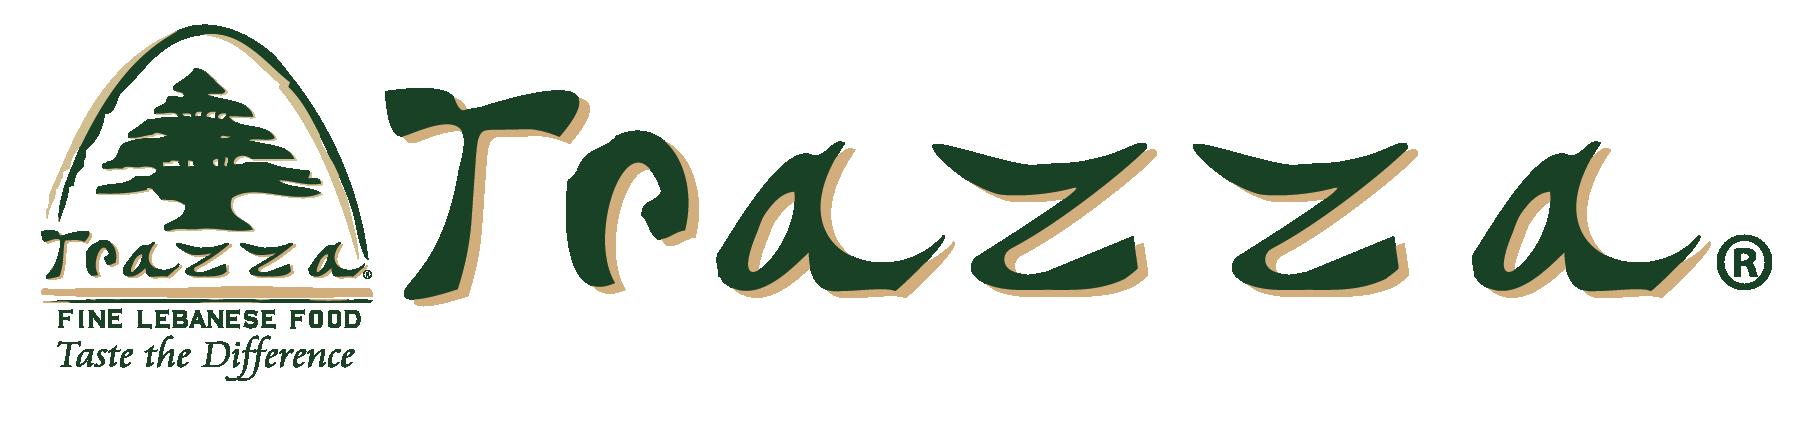 Trazza Foods